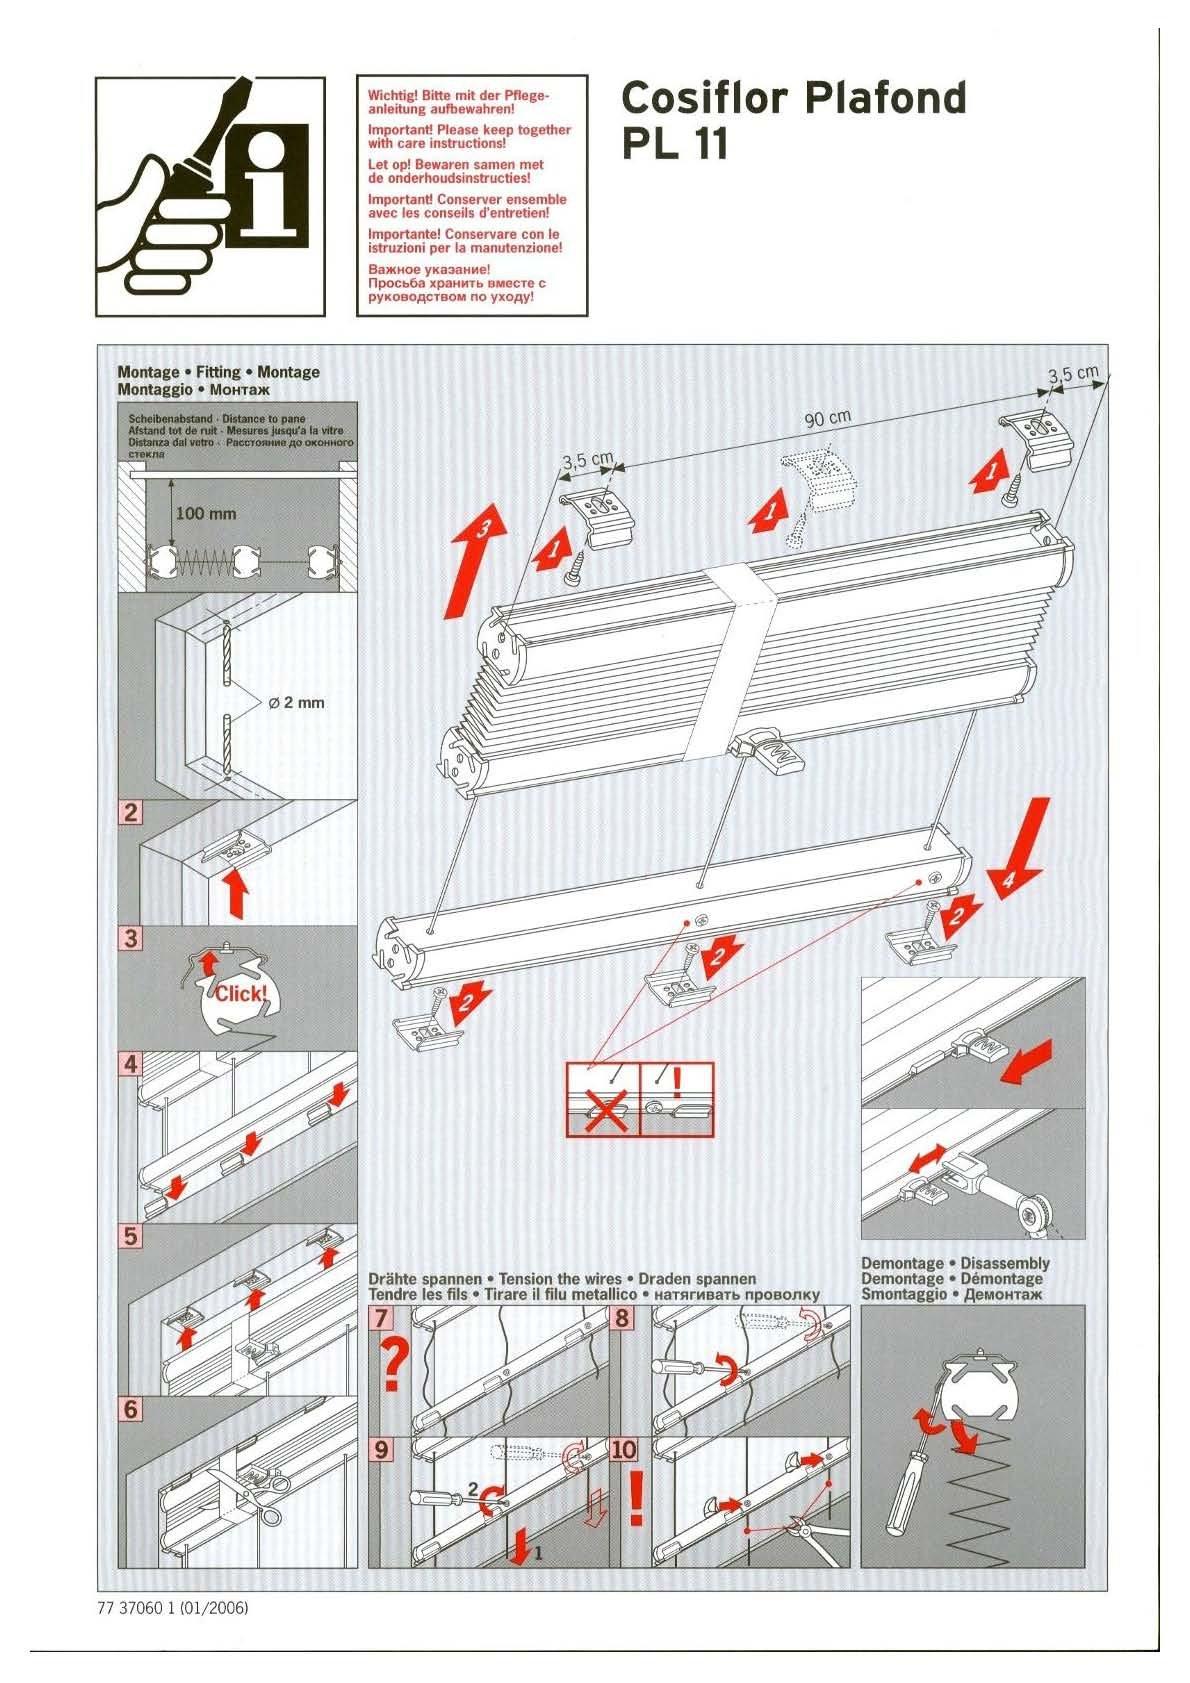 plissee plafondanlage cosiflor pl 11. Black Bedroom Furniture Sets. Home Design Ideas